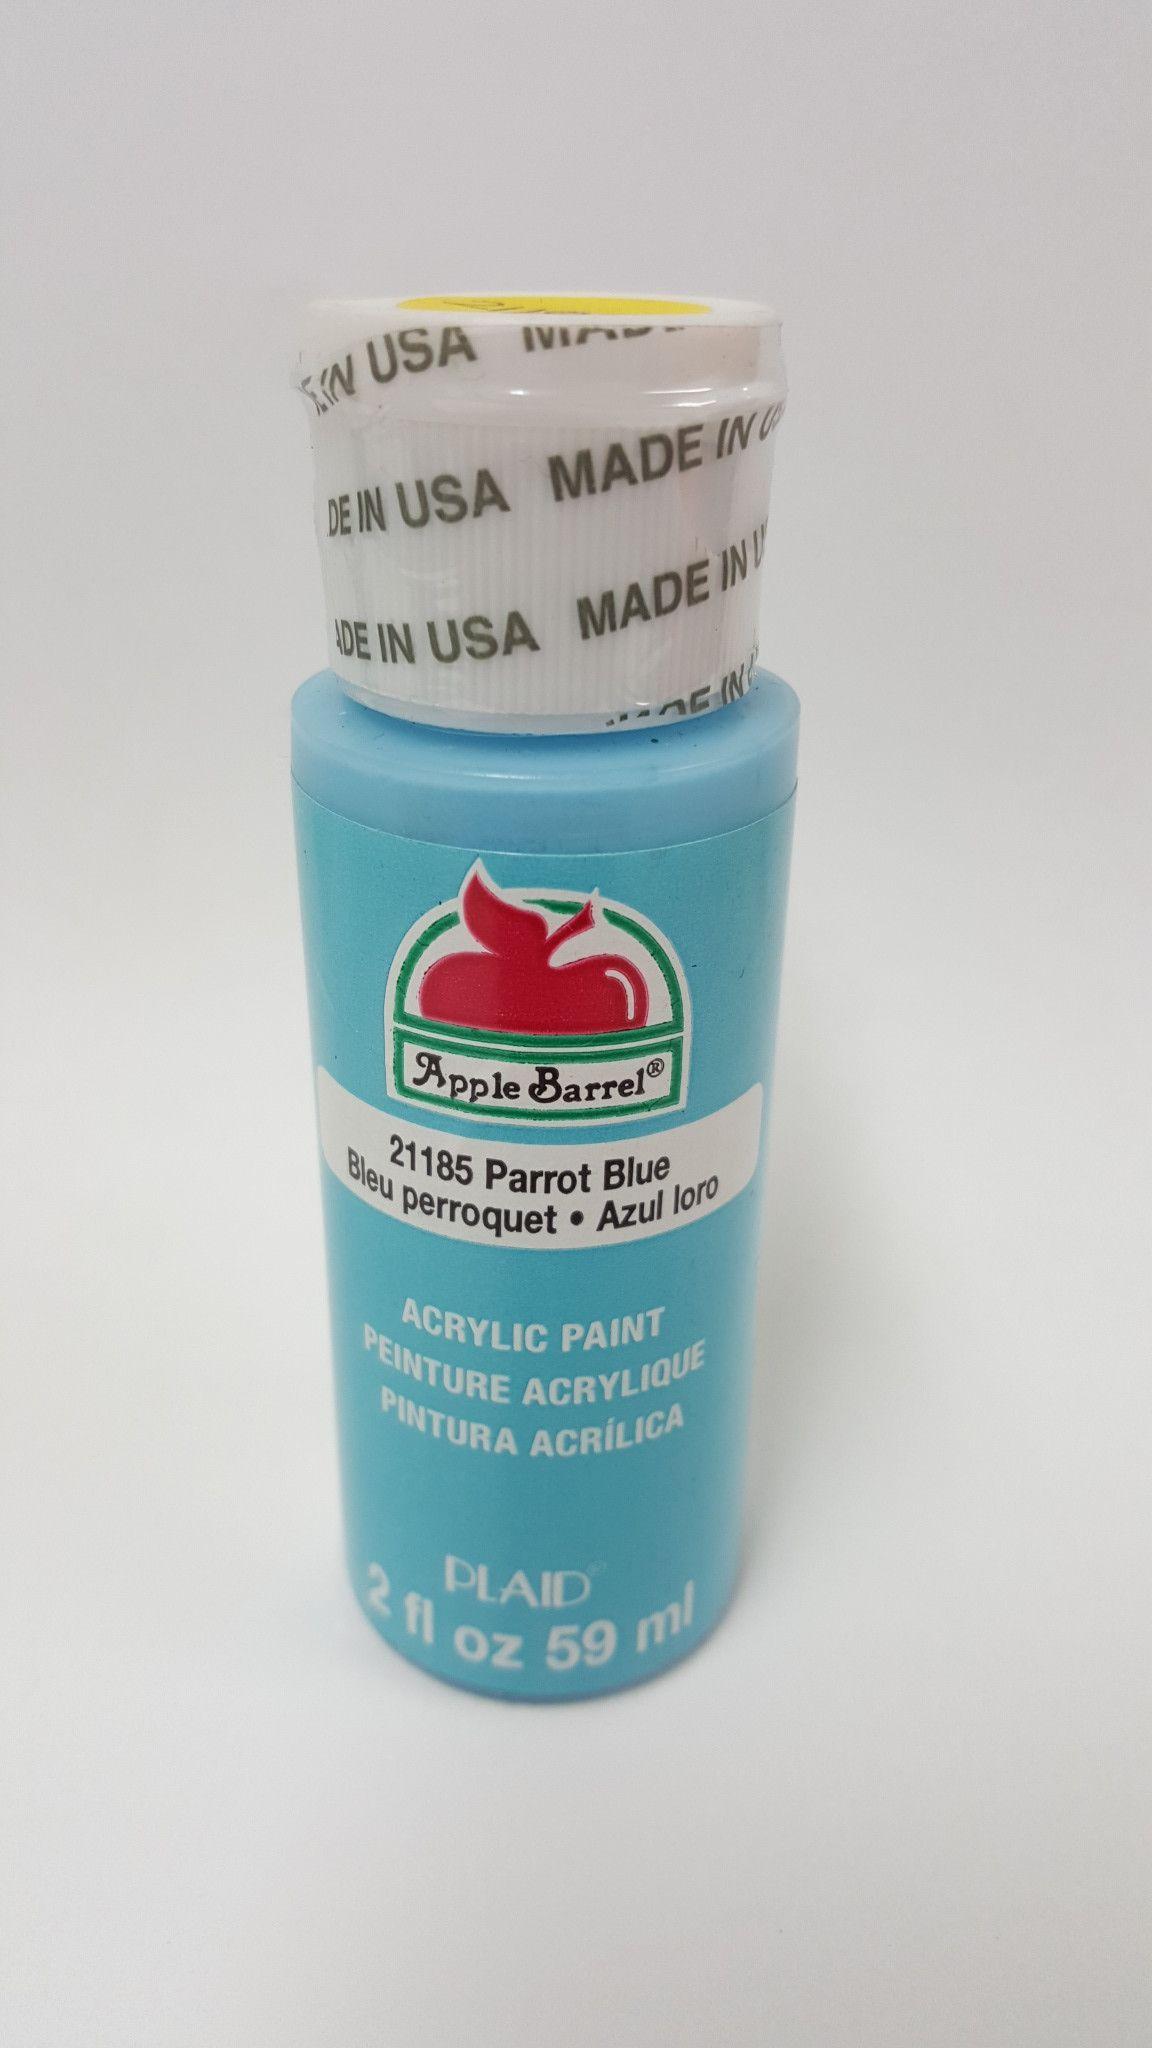 Apple Barrel 21185 Parrot Blue Acrylic Paint 2 fl oz